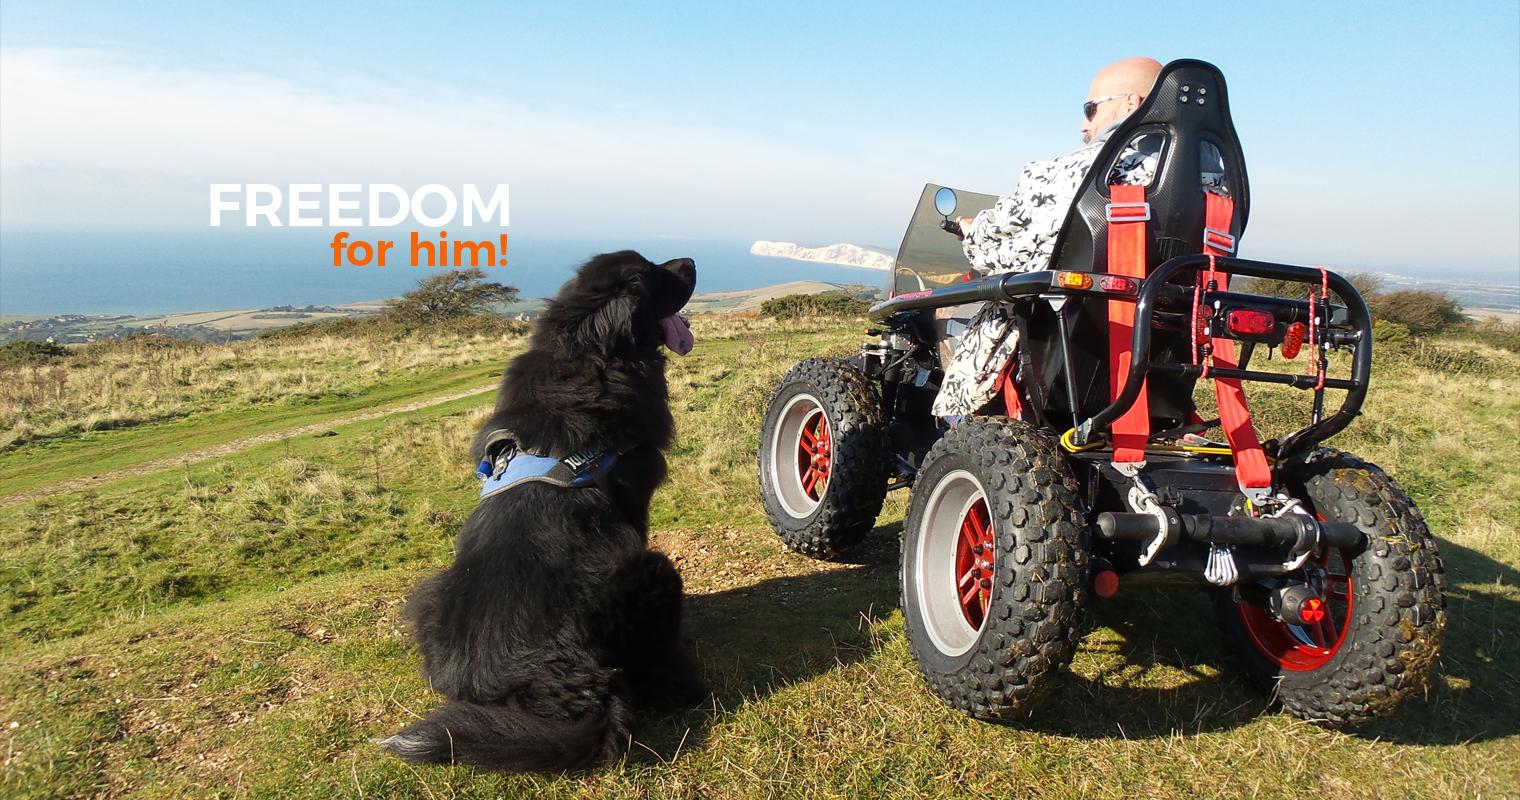 slide-11-terrainhopper-freedom-newfoundland-puppy-monster-wheels